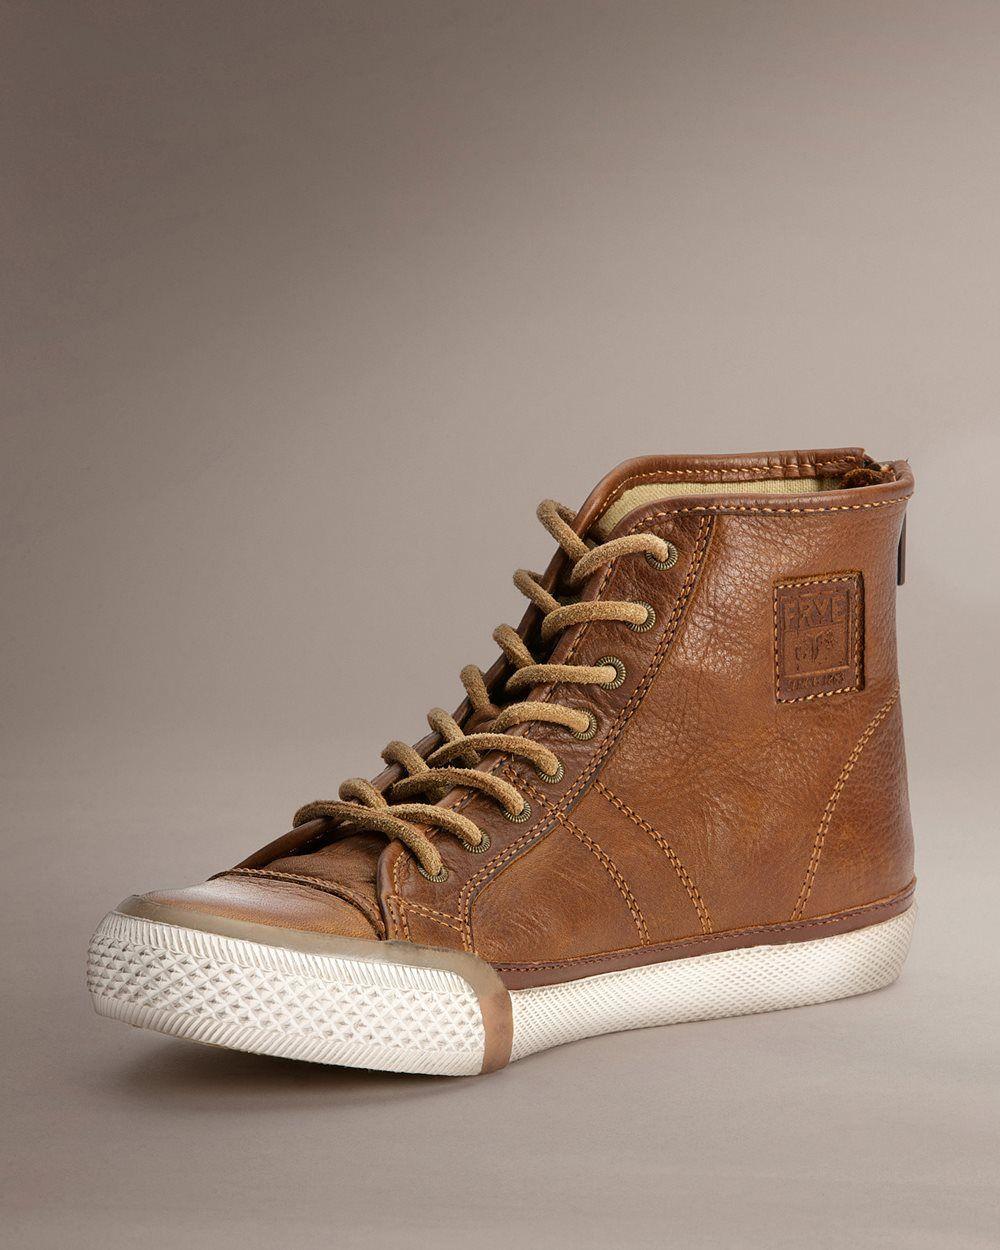 Leather sneakers women